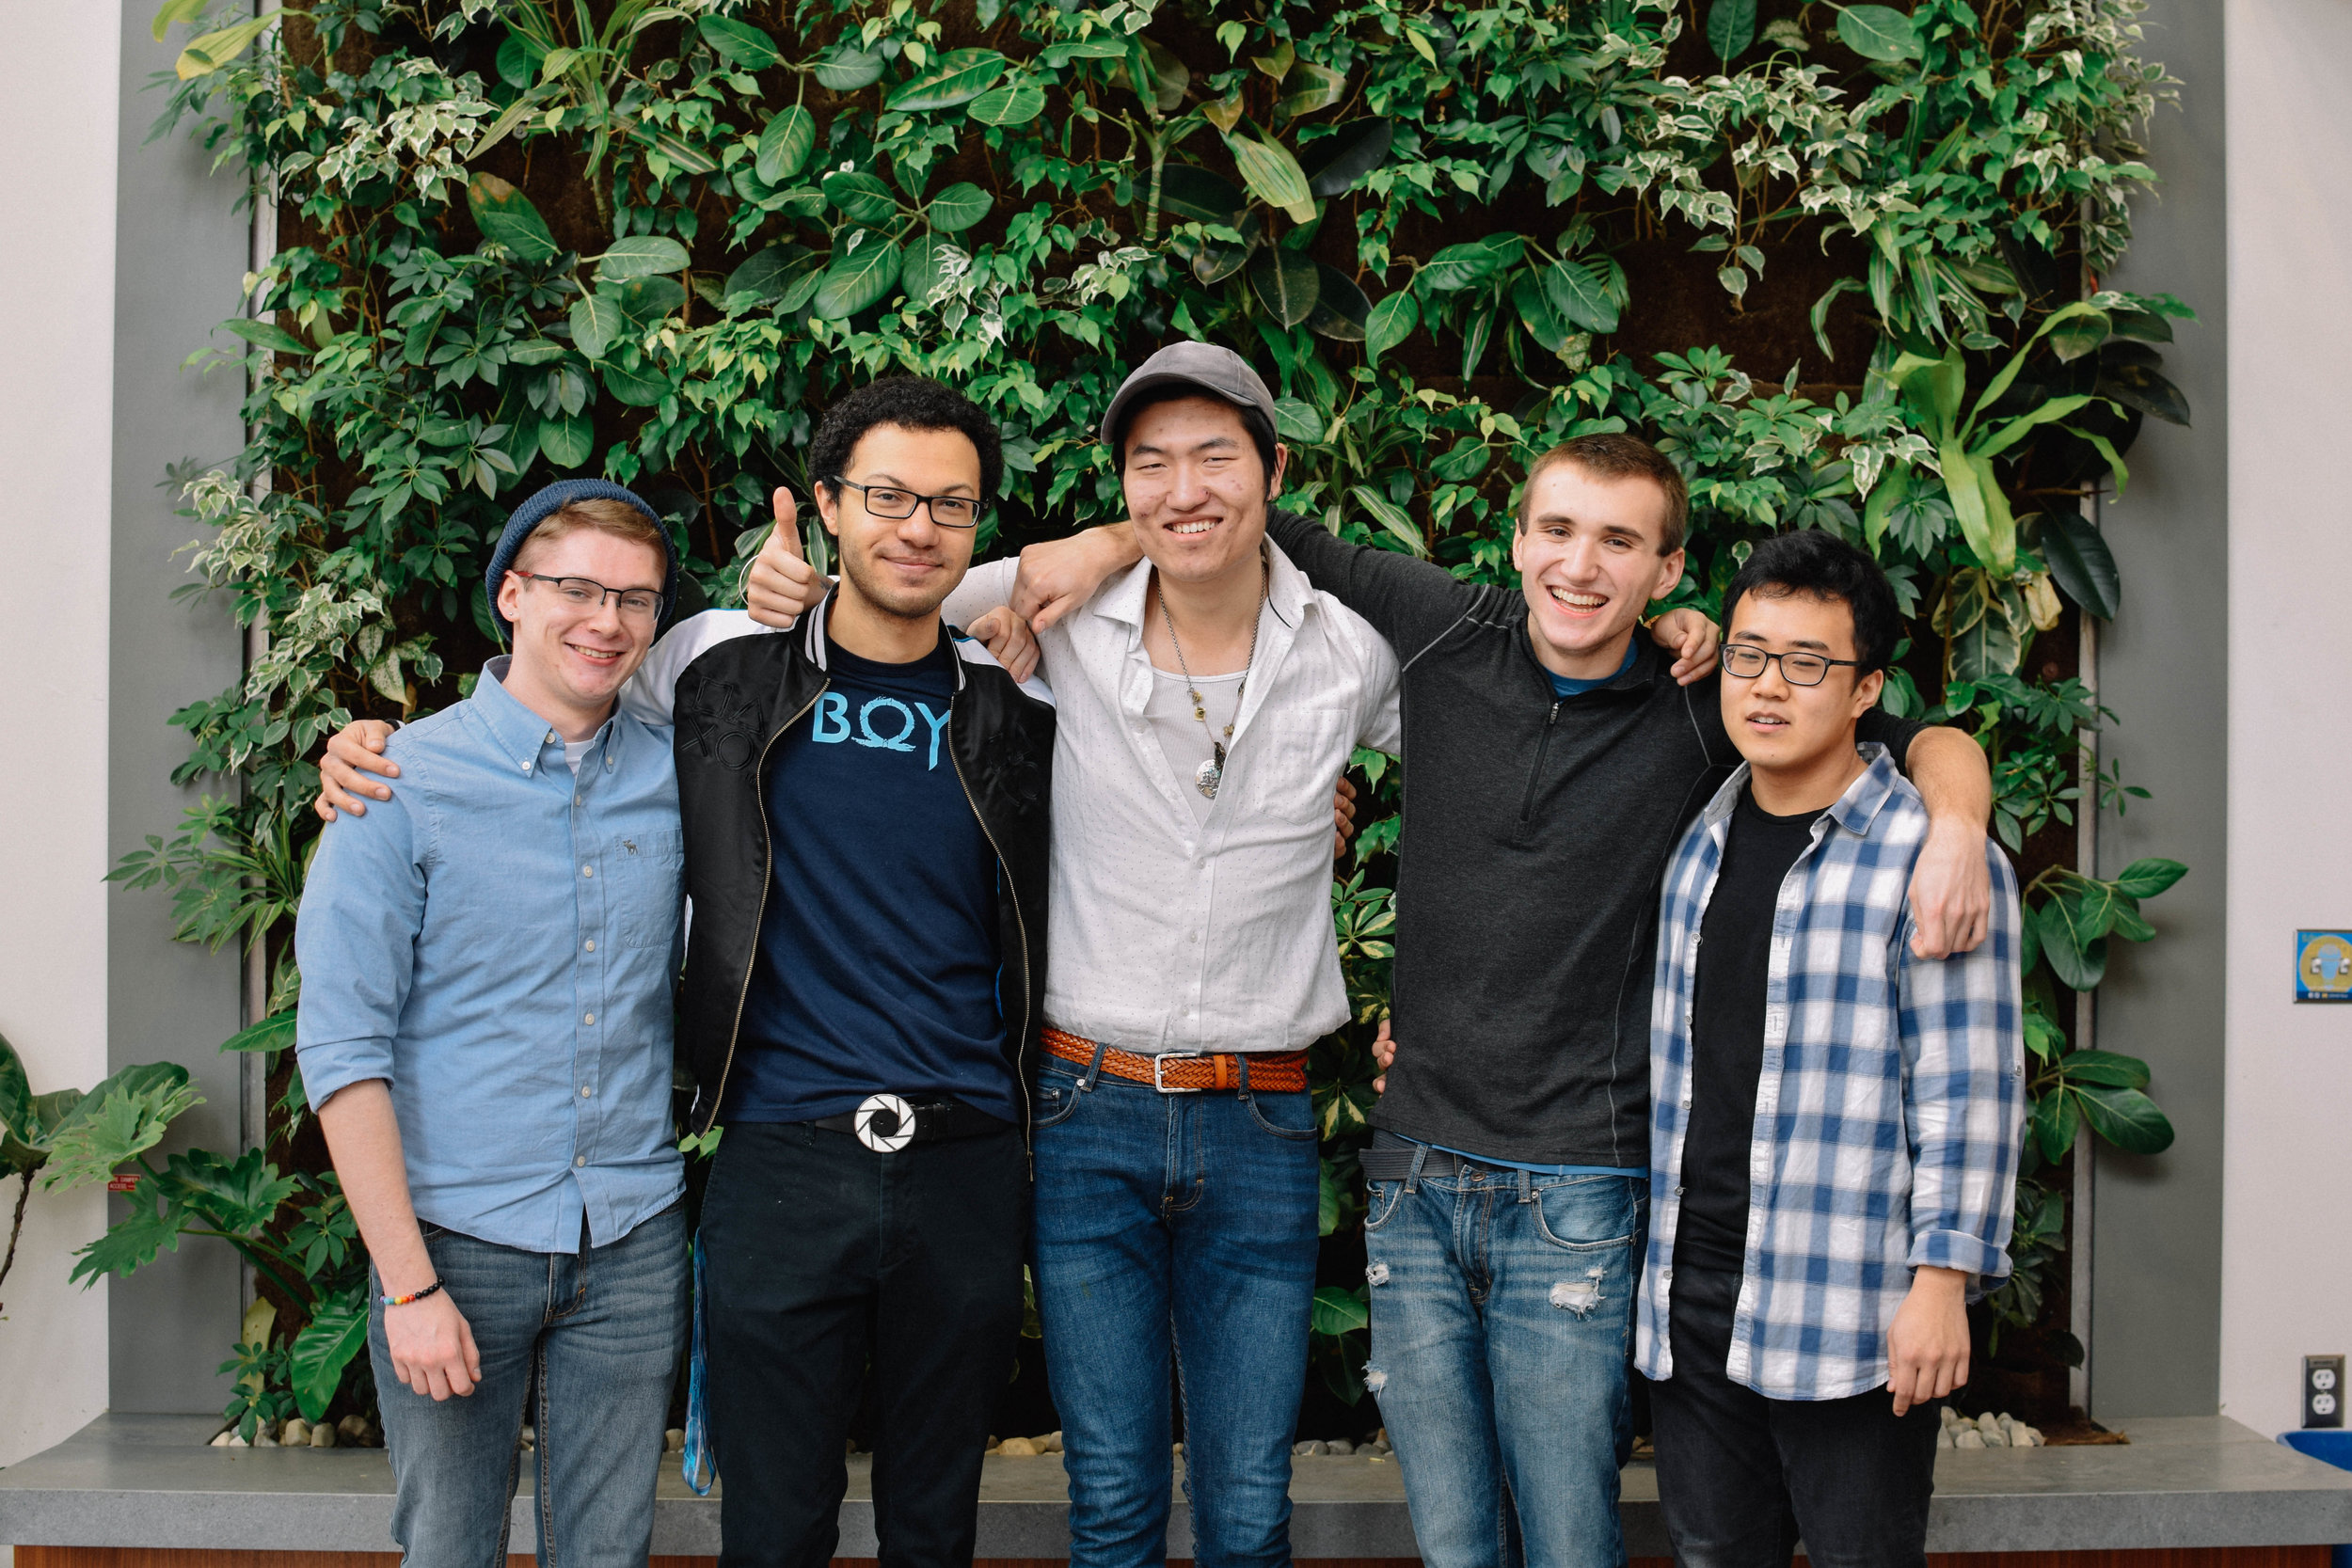 Casual Gaming Corp - Creating a welcoming and non-toxic community for gamers of all identitiesALEX PAN, BRENDAN HEINONEN, JOSHUA HOWARD, DUEY SMITH, HYUK AHN